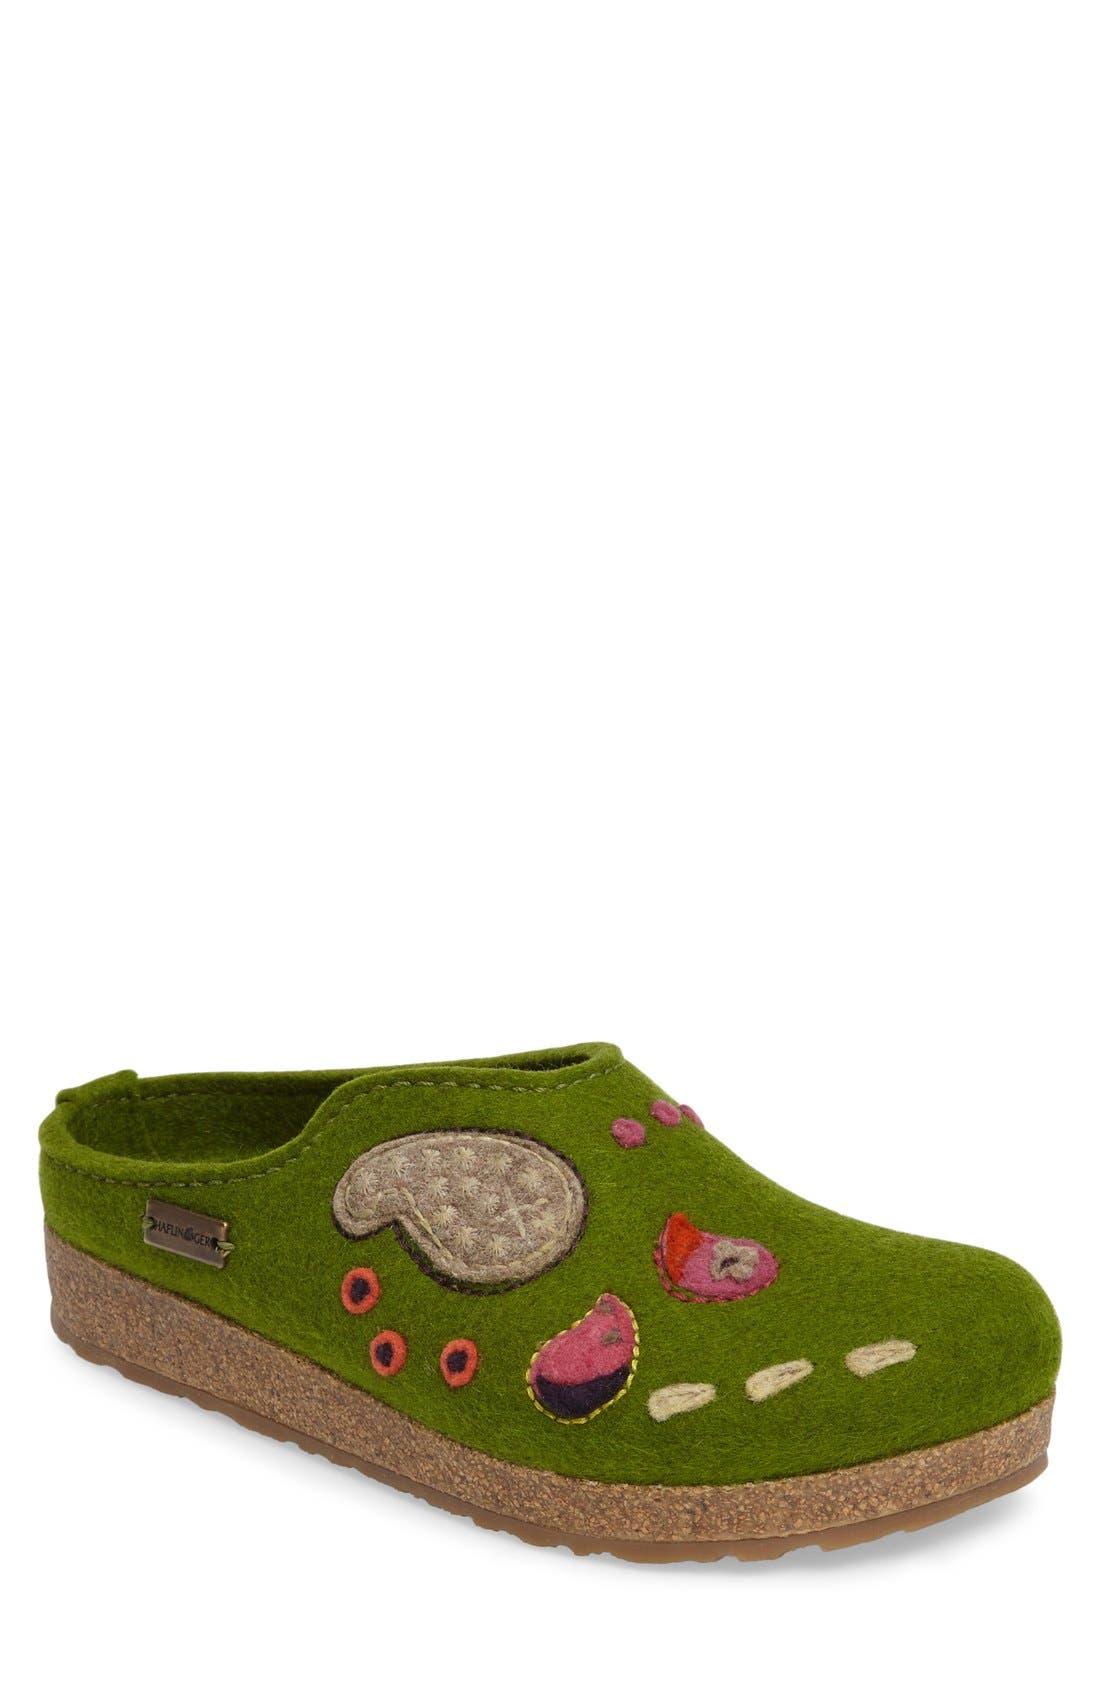 Paisley Slipper,                         Main,                         color, Green Wool